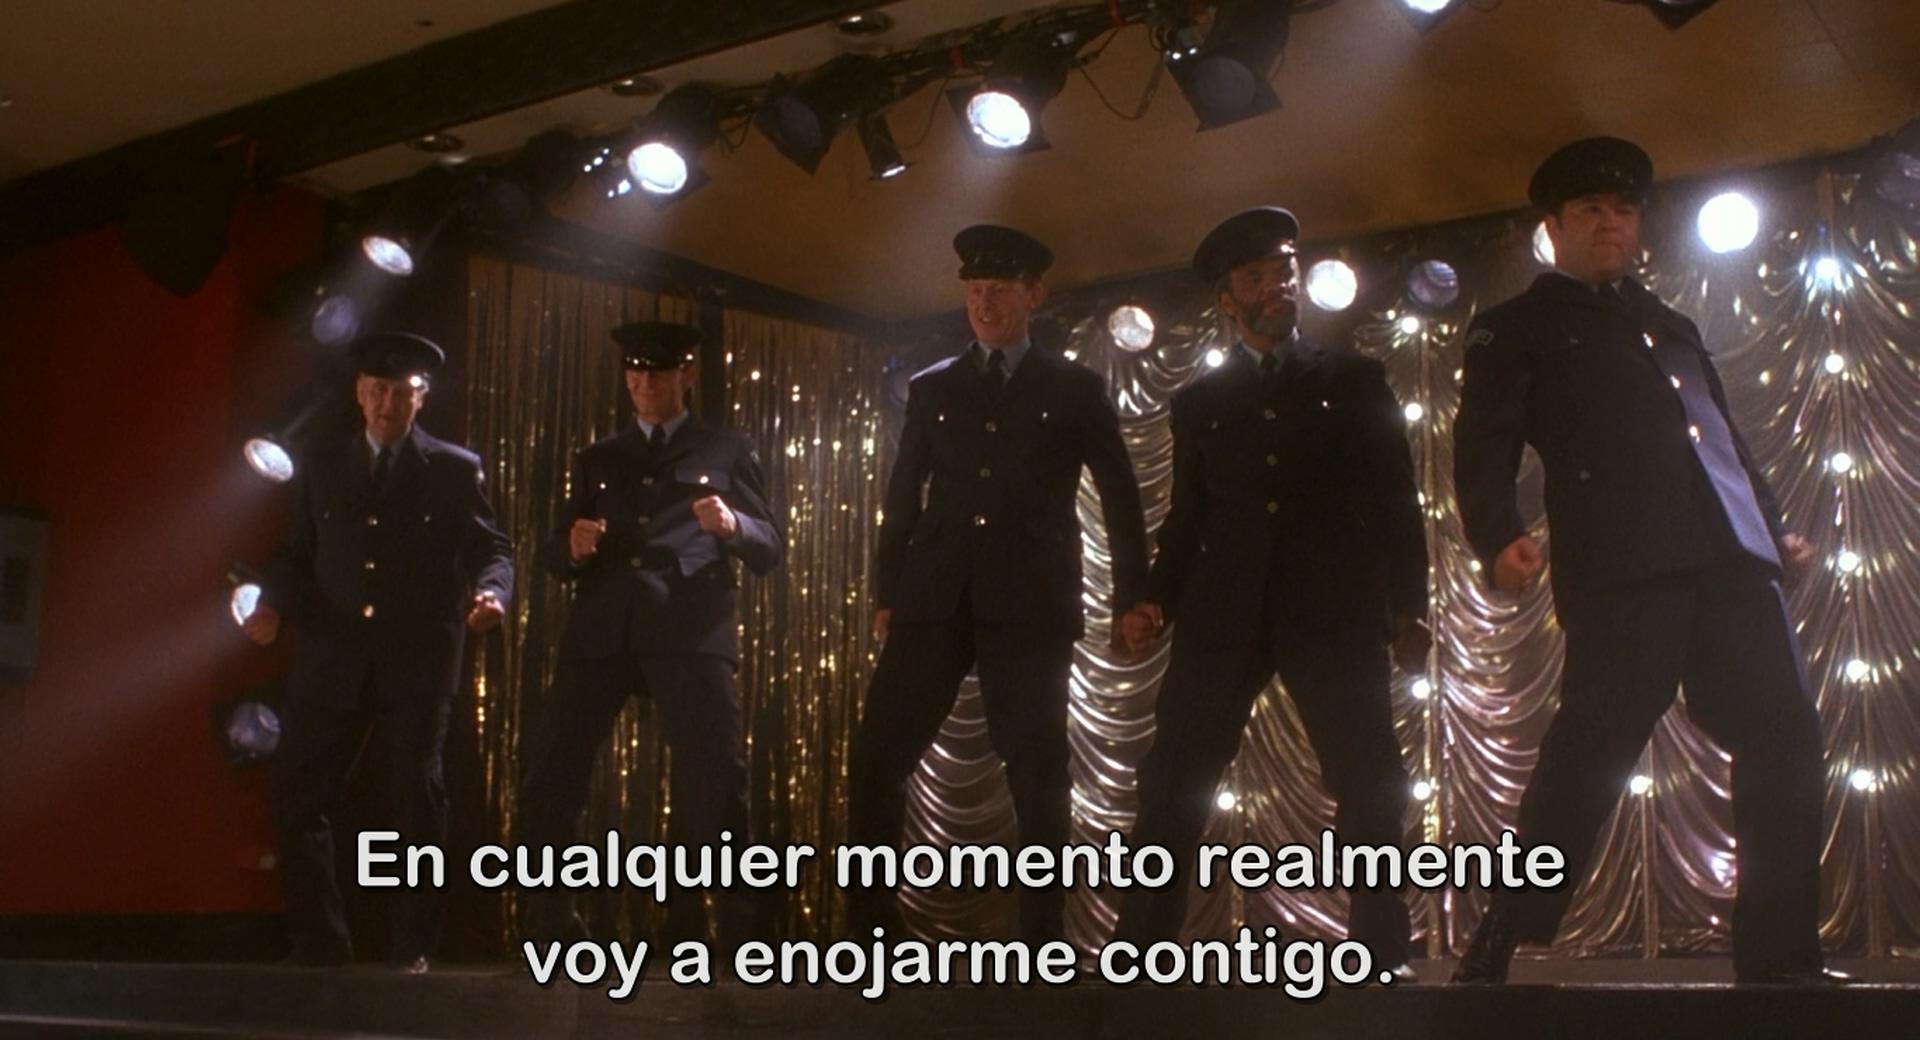 The Full Monty (1997) 1080p x265 10Bits